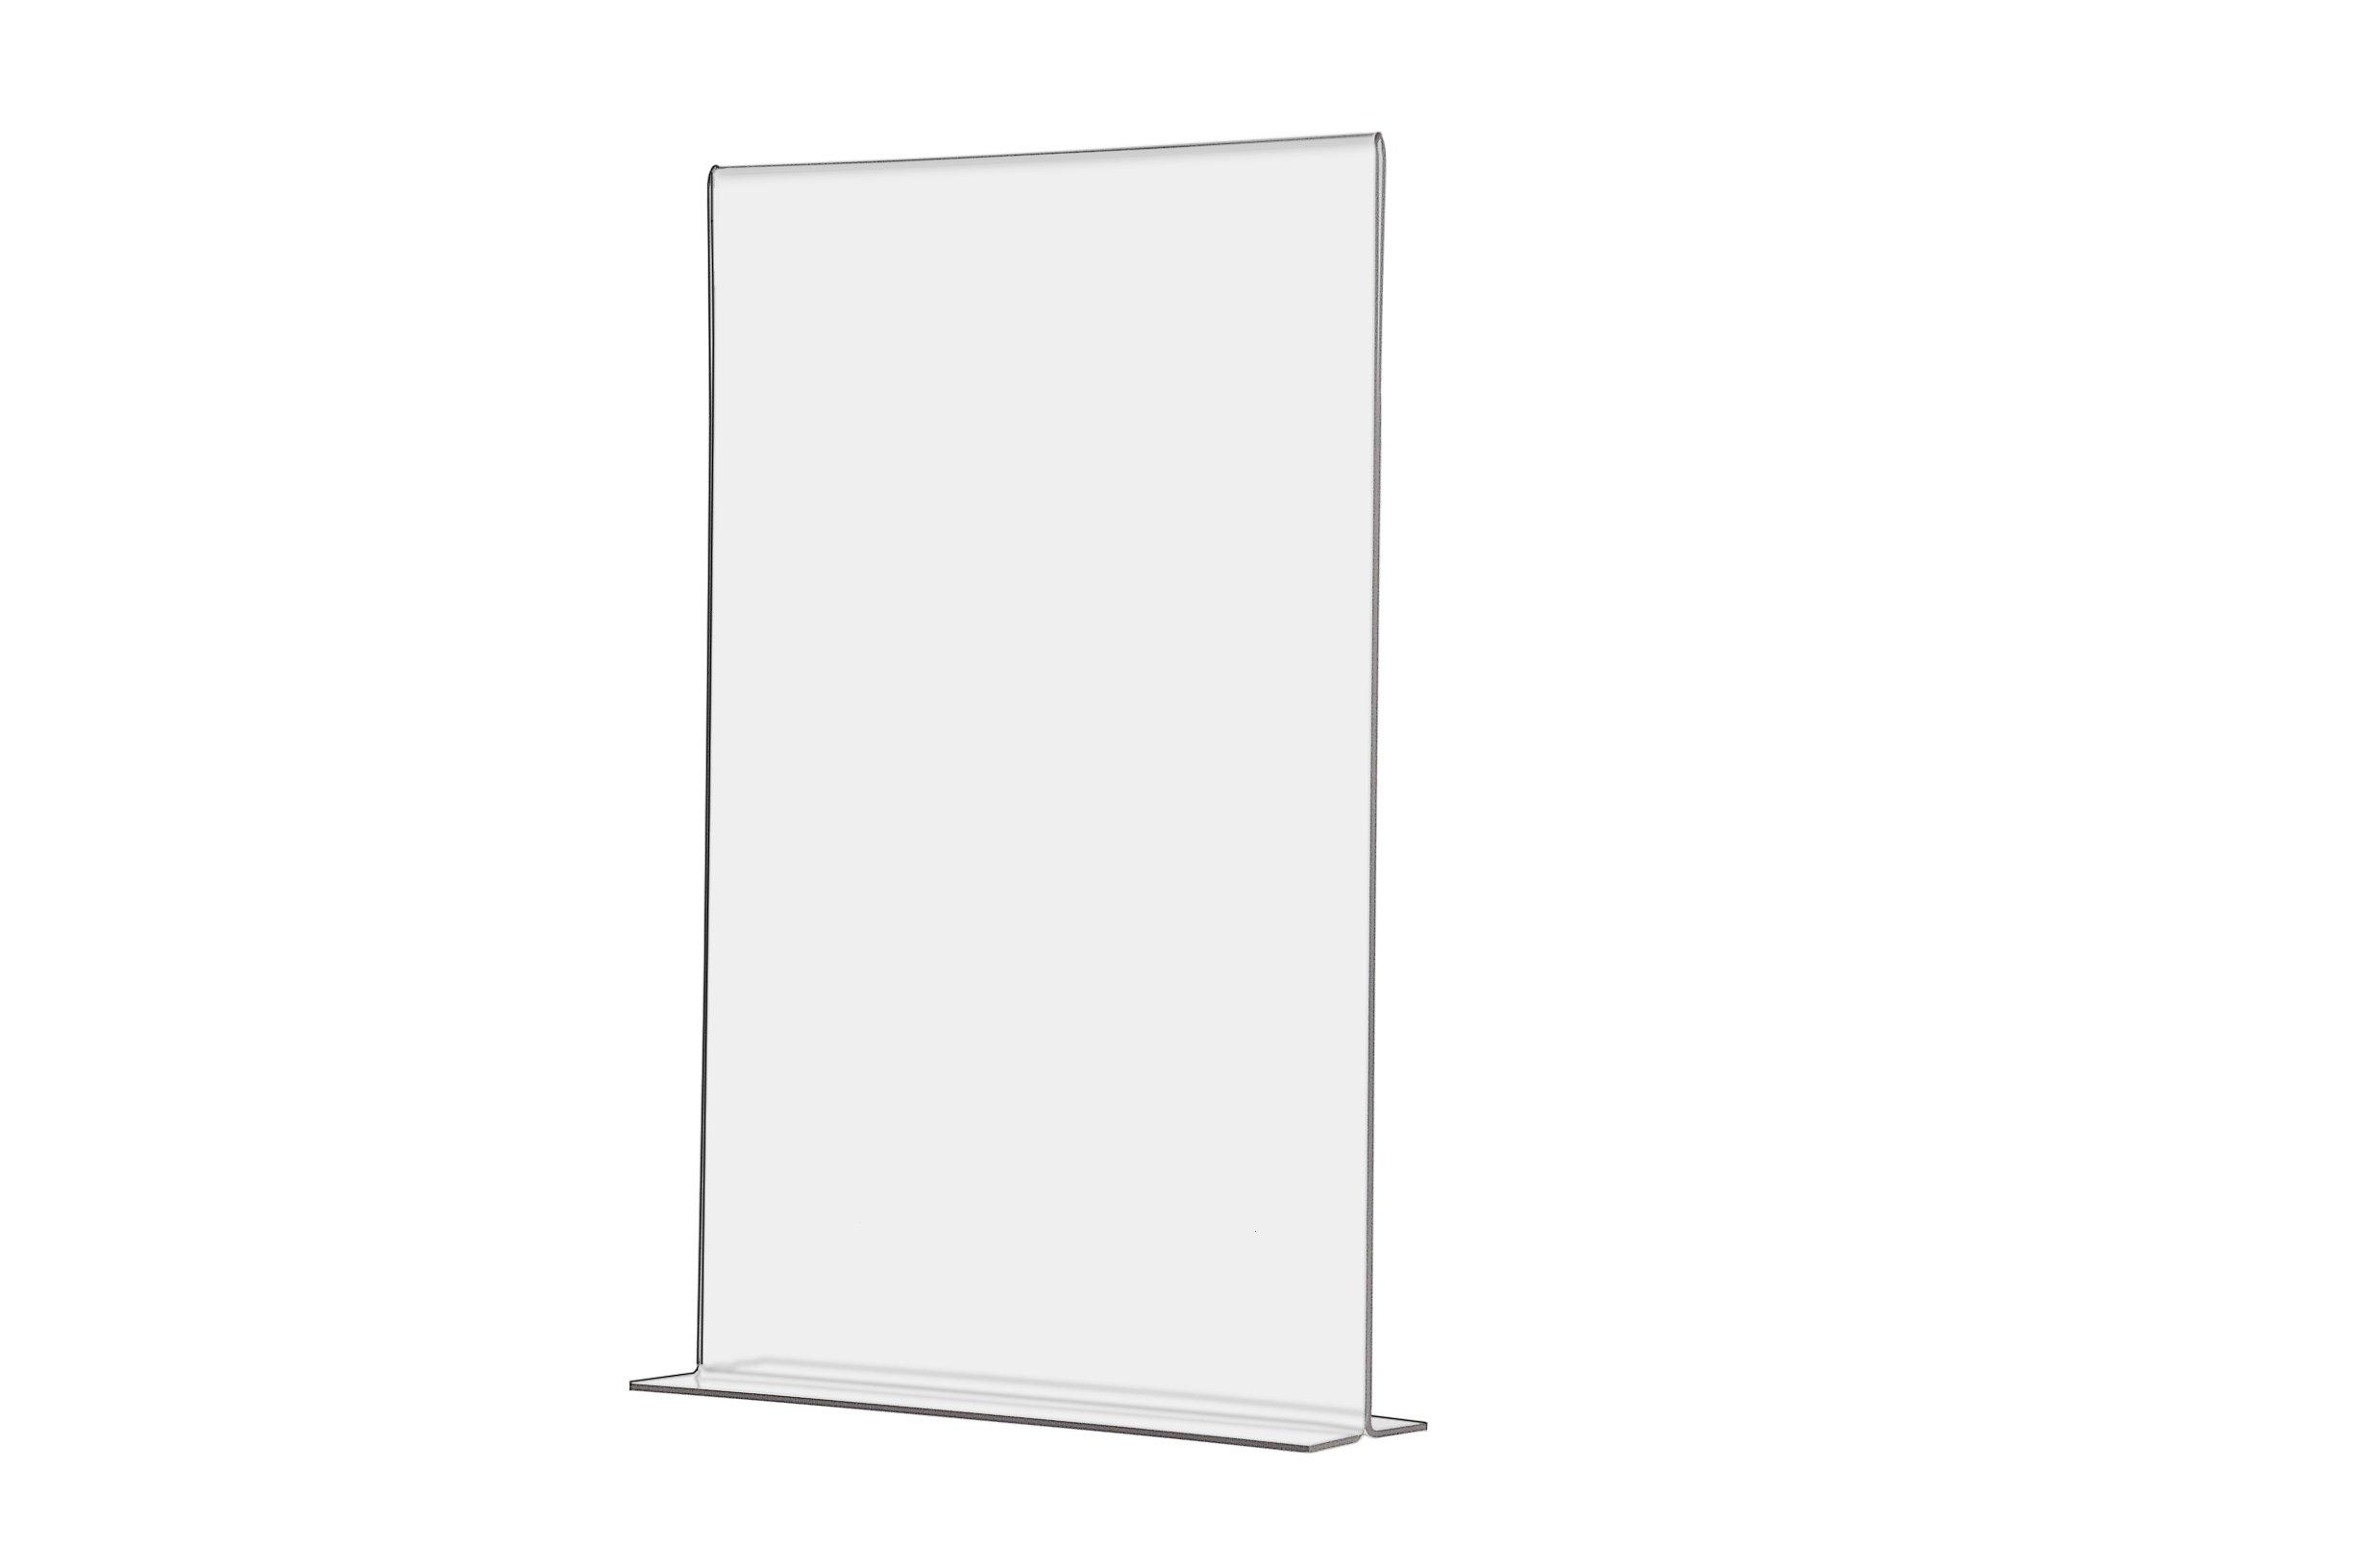 Marketing Holders Acrylic Bottom Loading Flyer Frame Menu Signage Countertop 11x17 Lot of 1